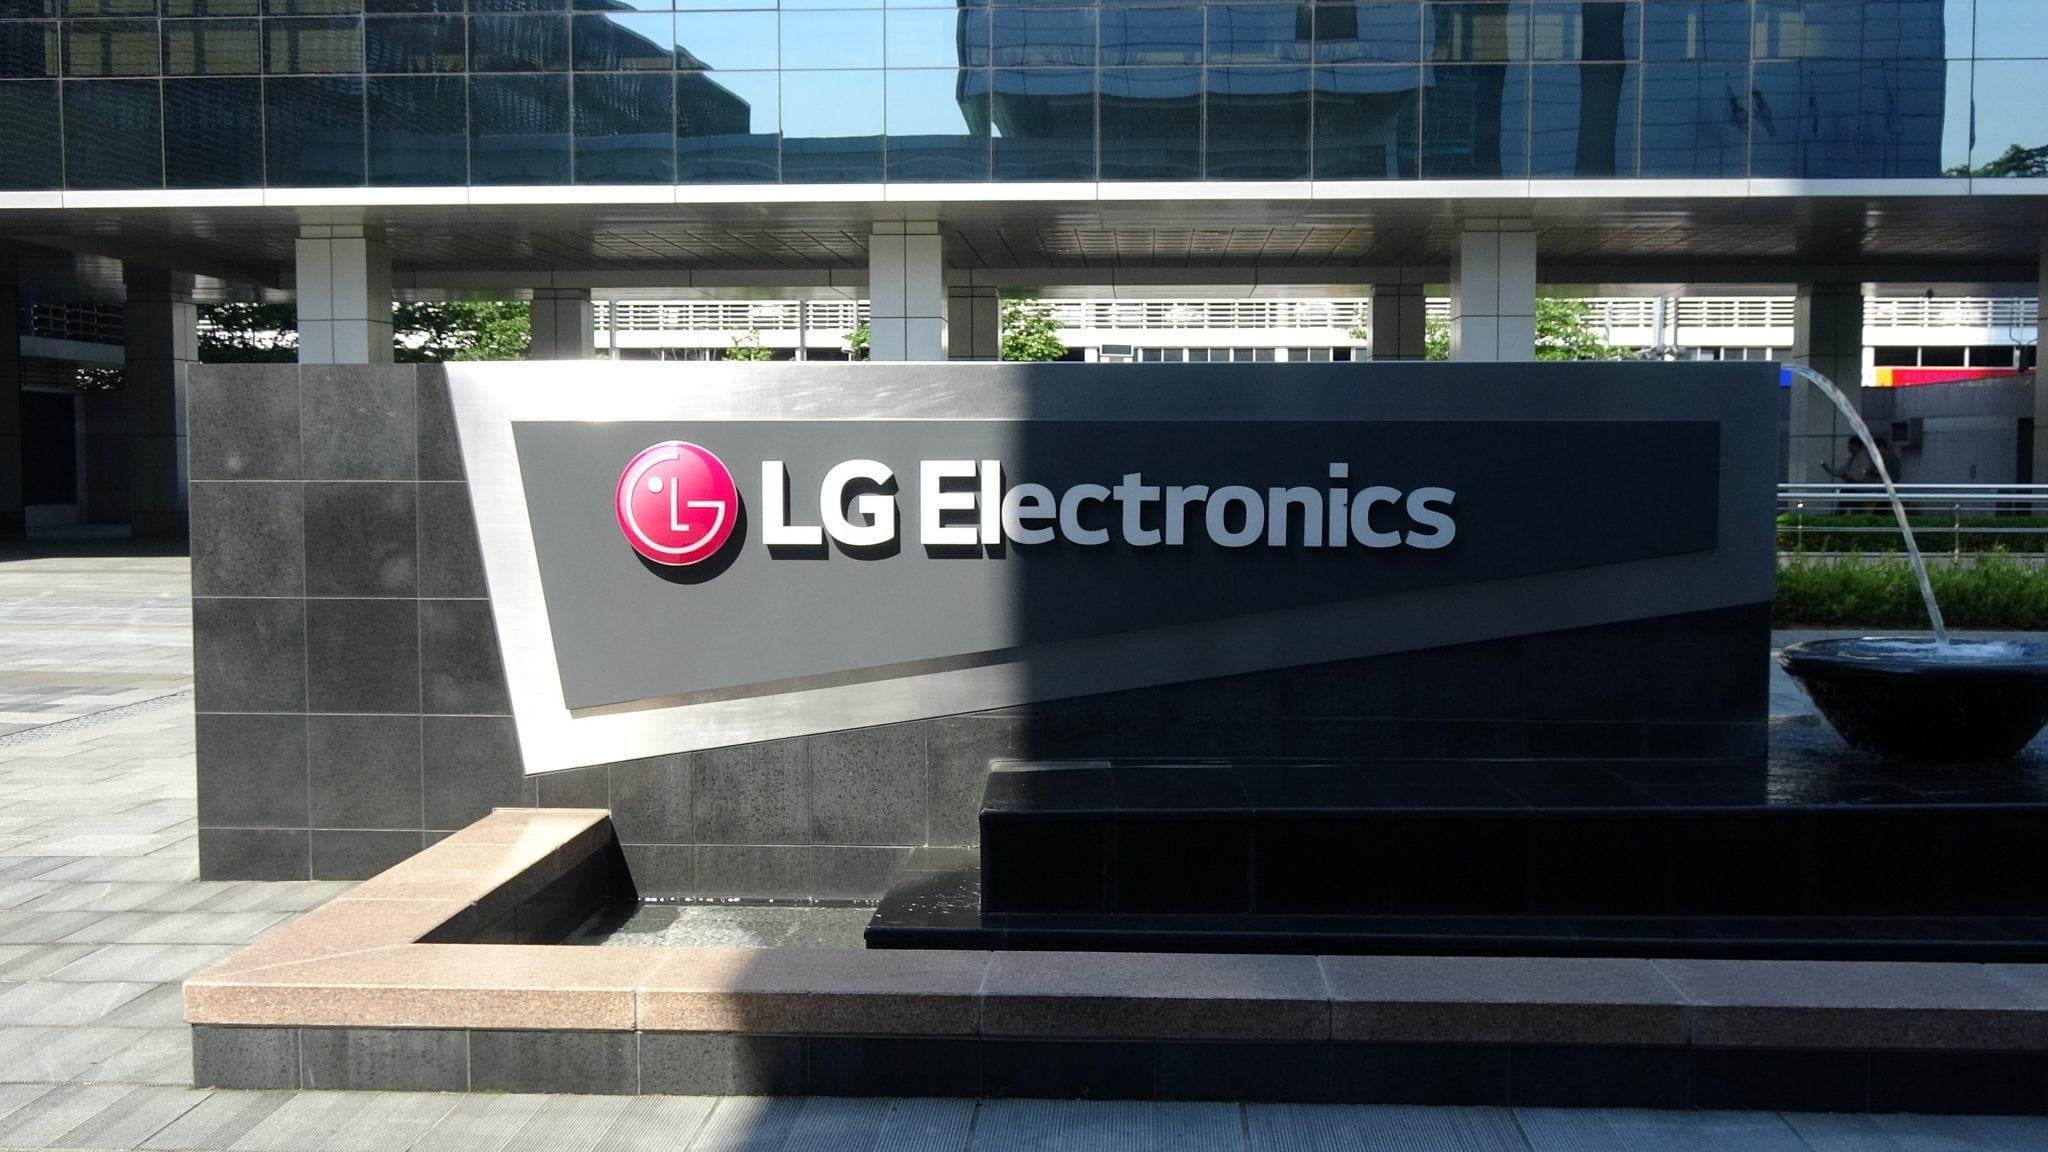 LG Seocho R&D Center